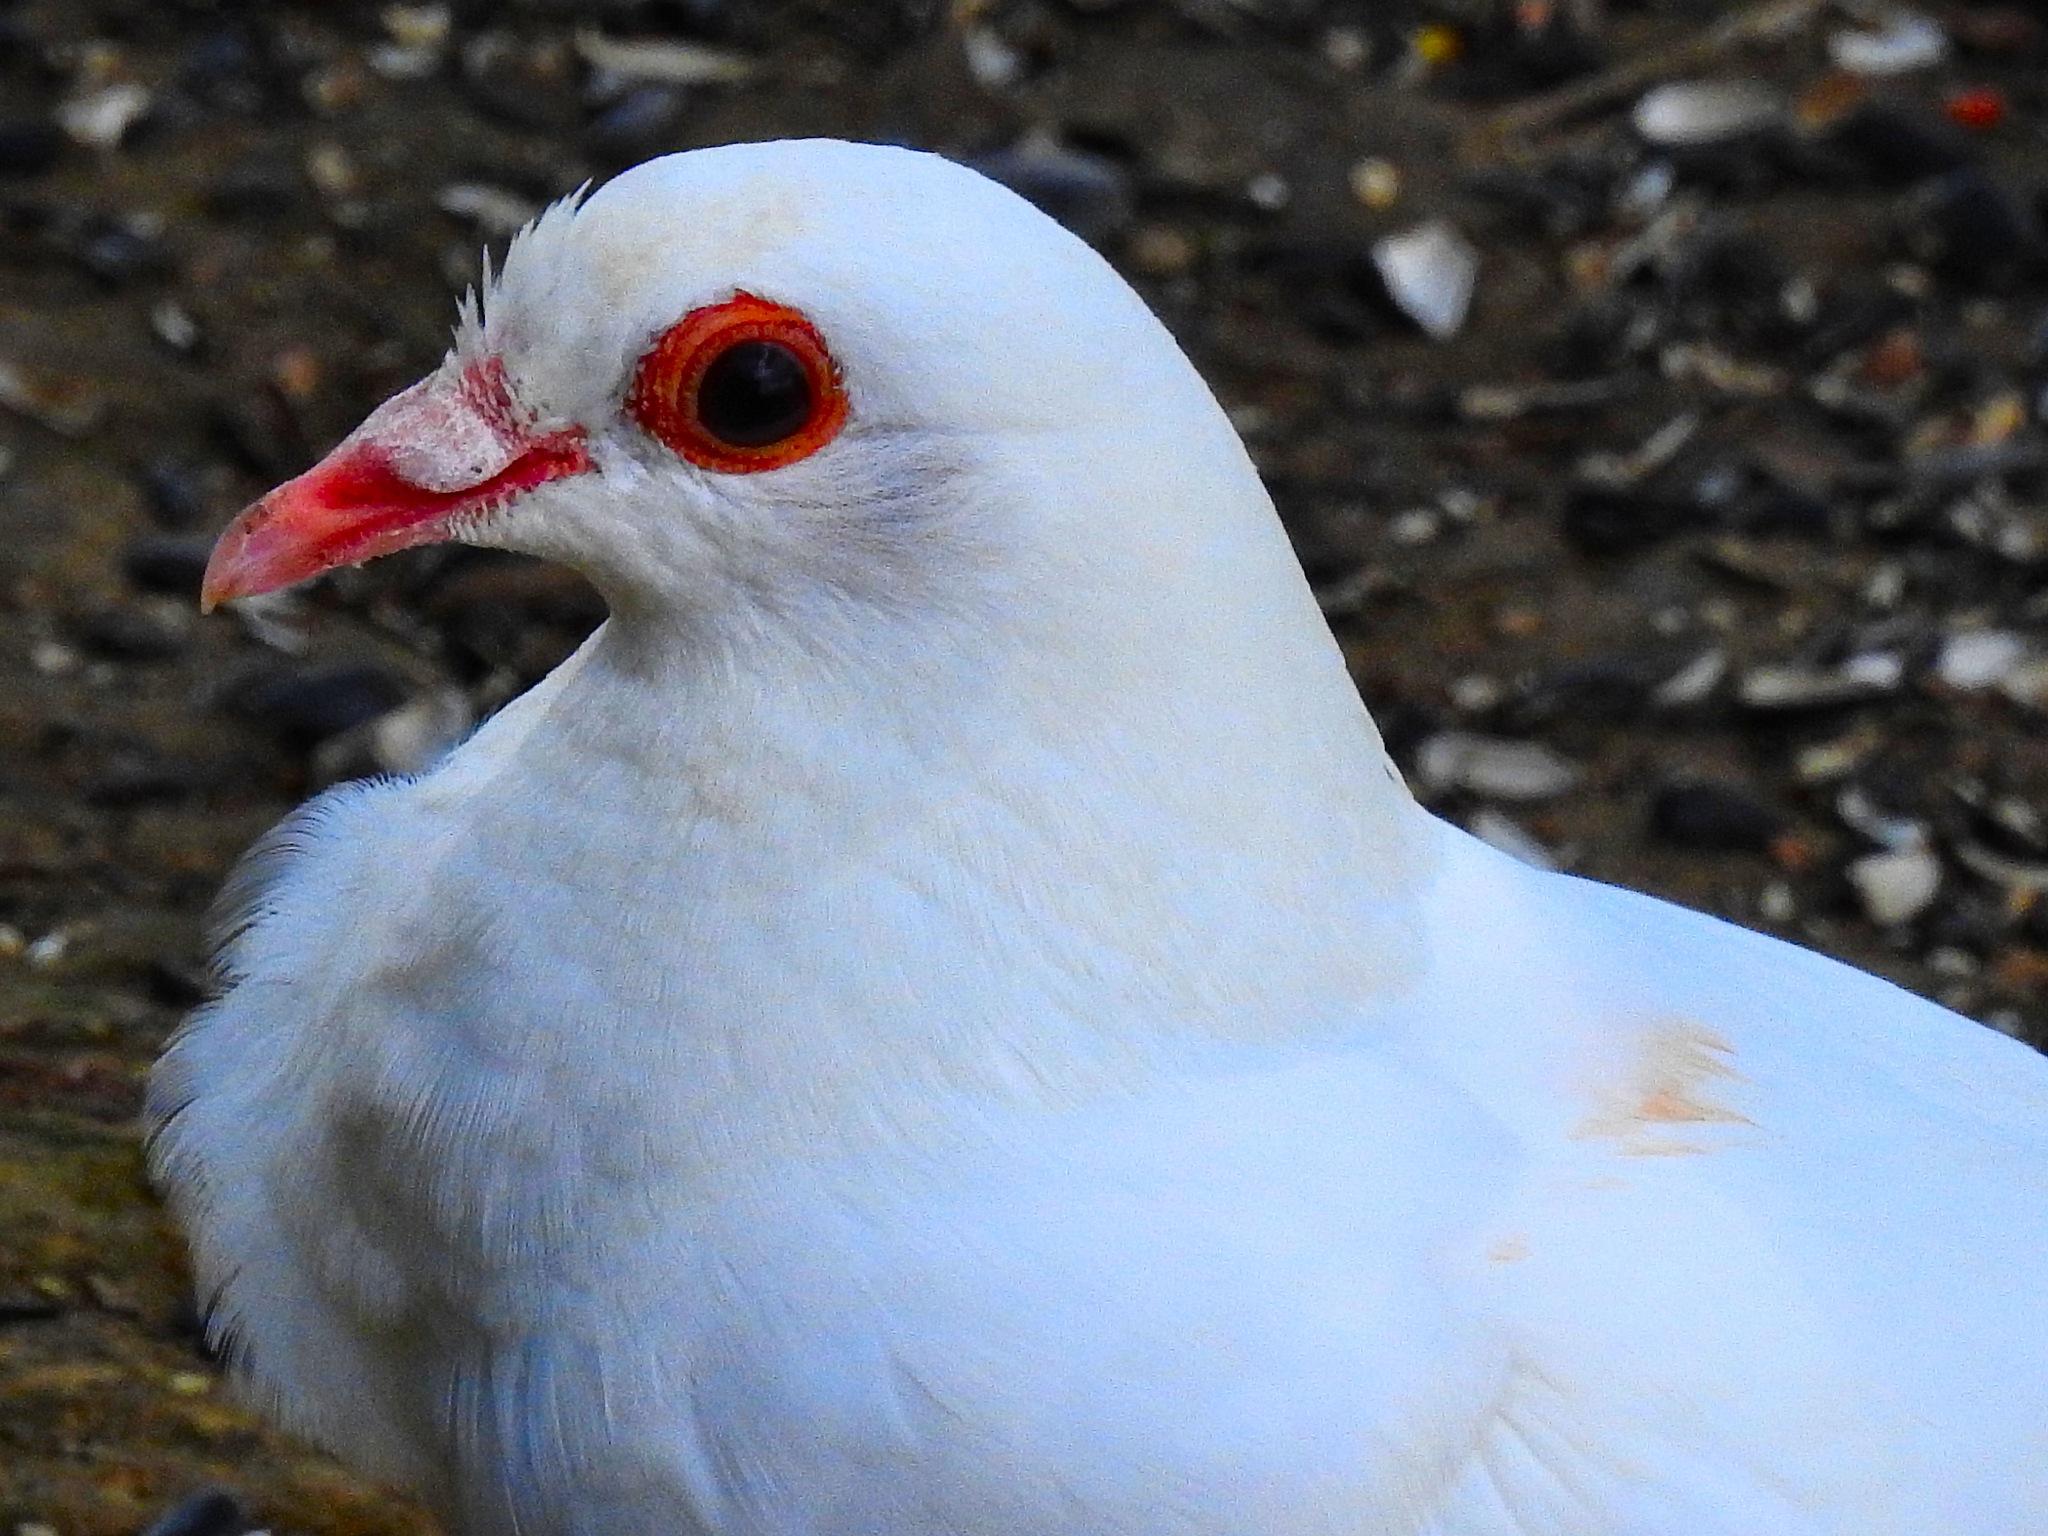 Albino Pigeon by Patty Stockton